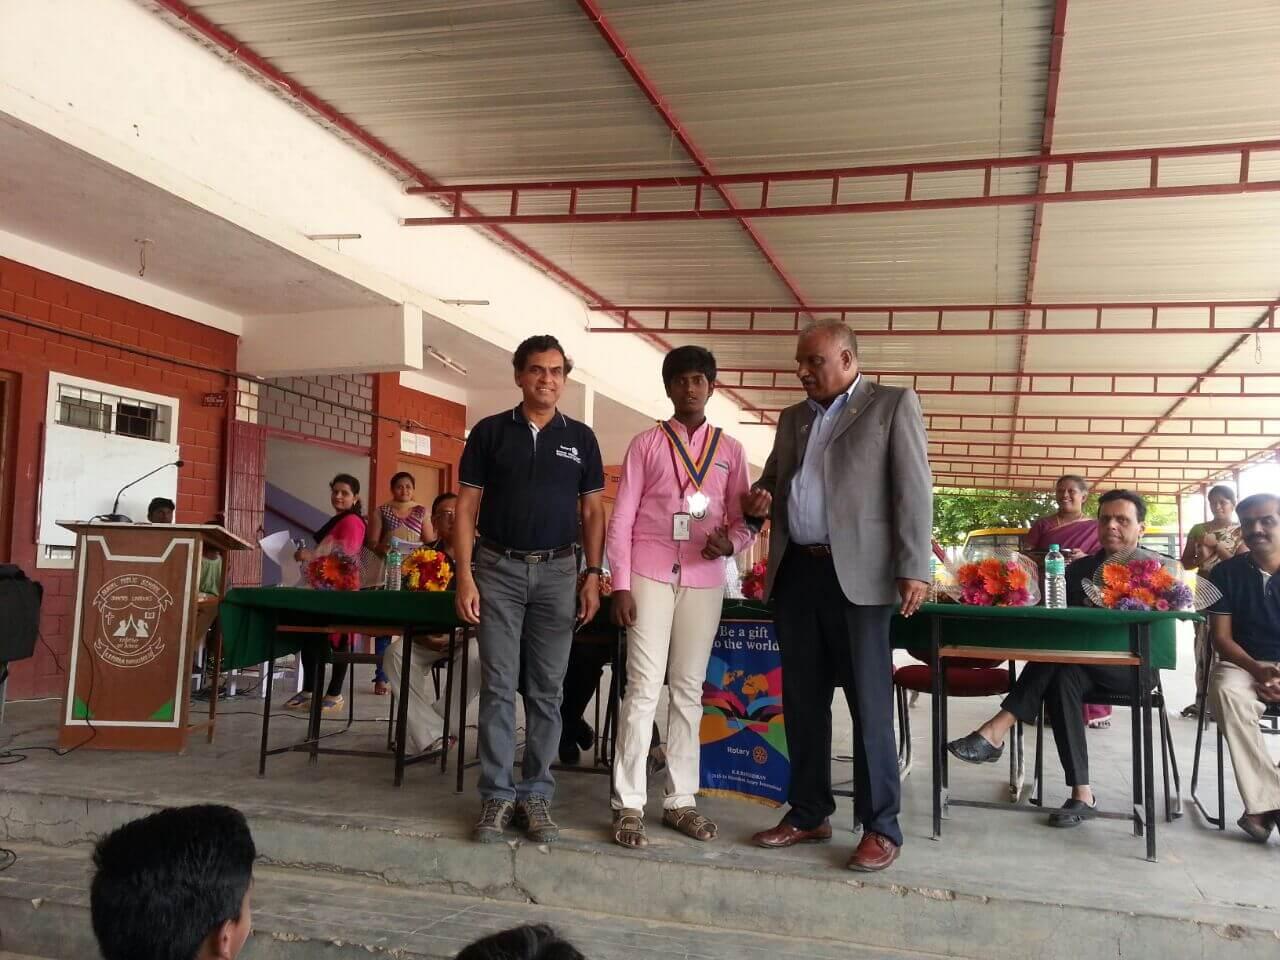 Formation of Interact club at Samuel Public School